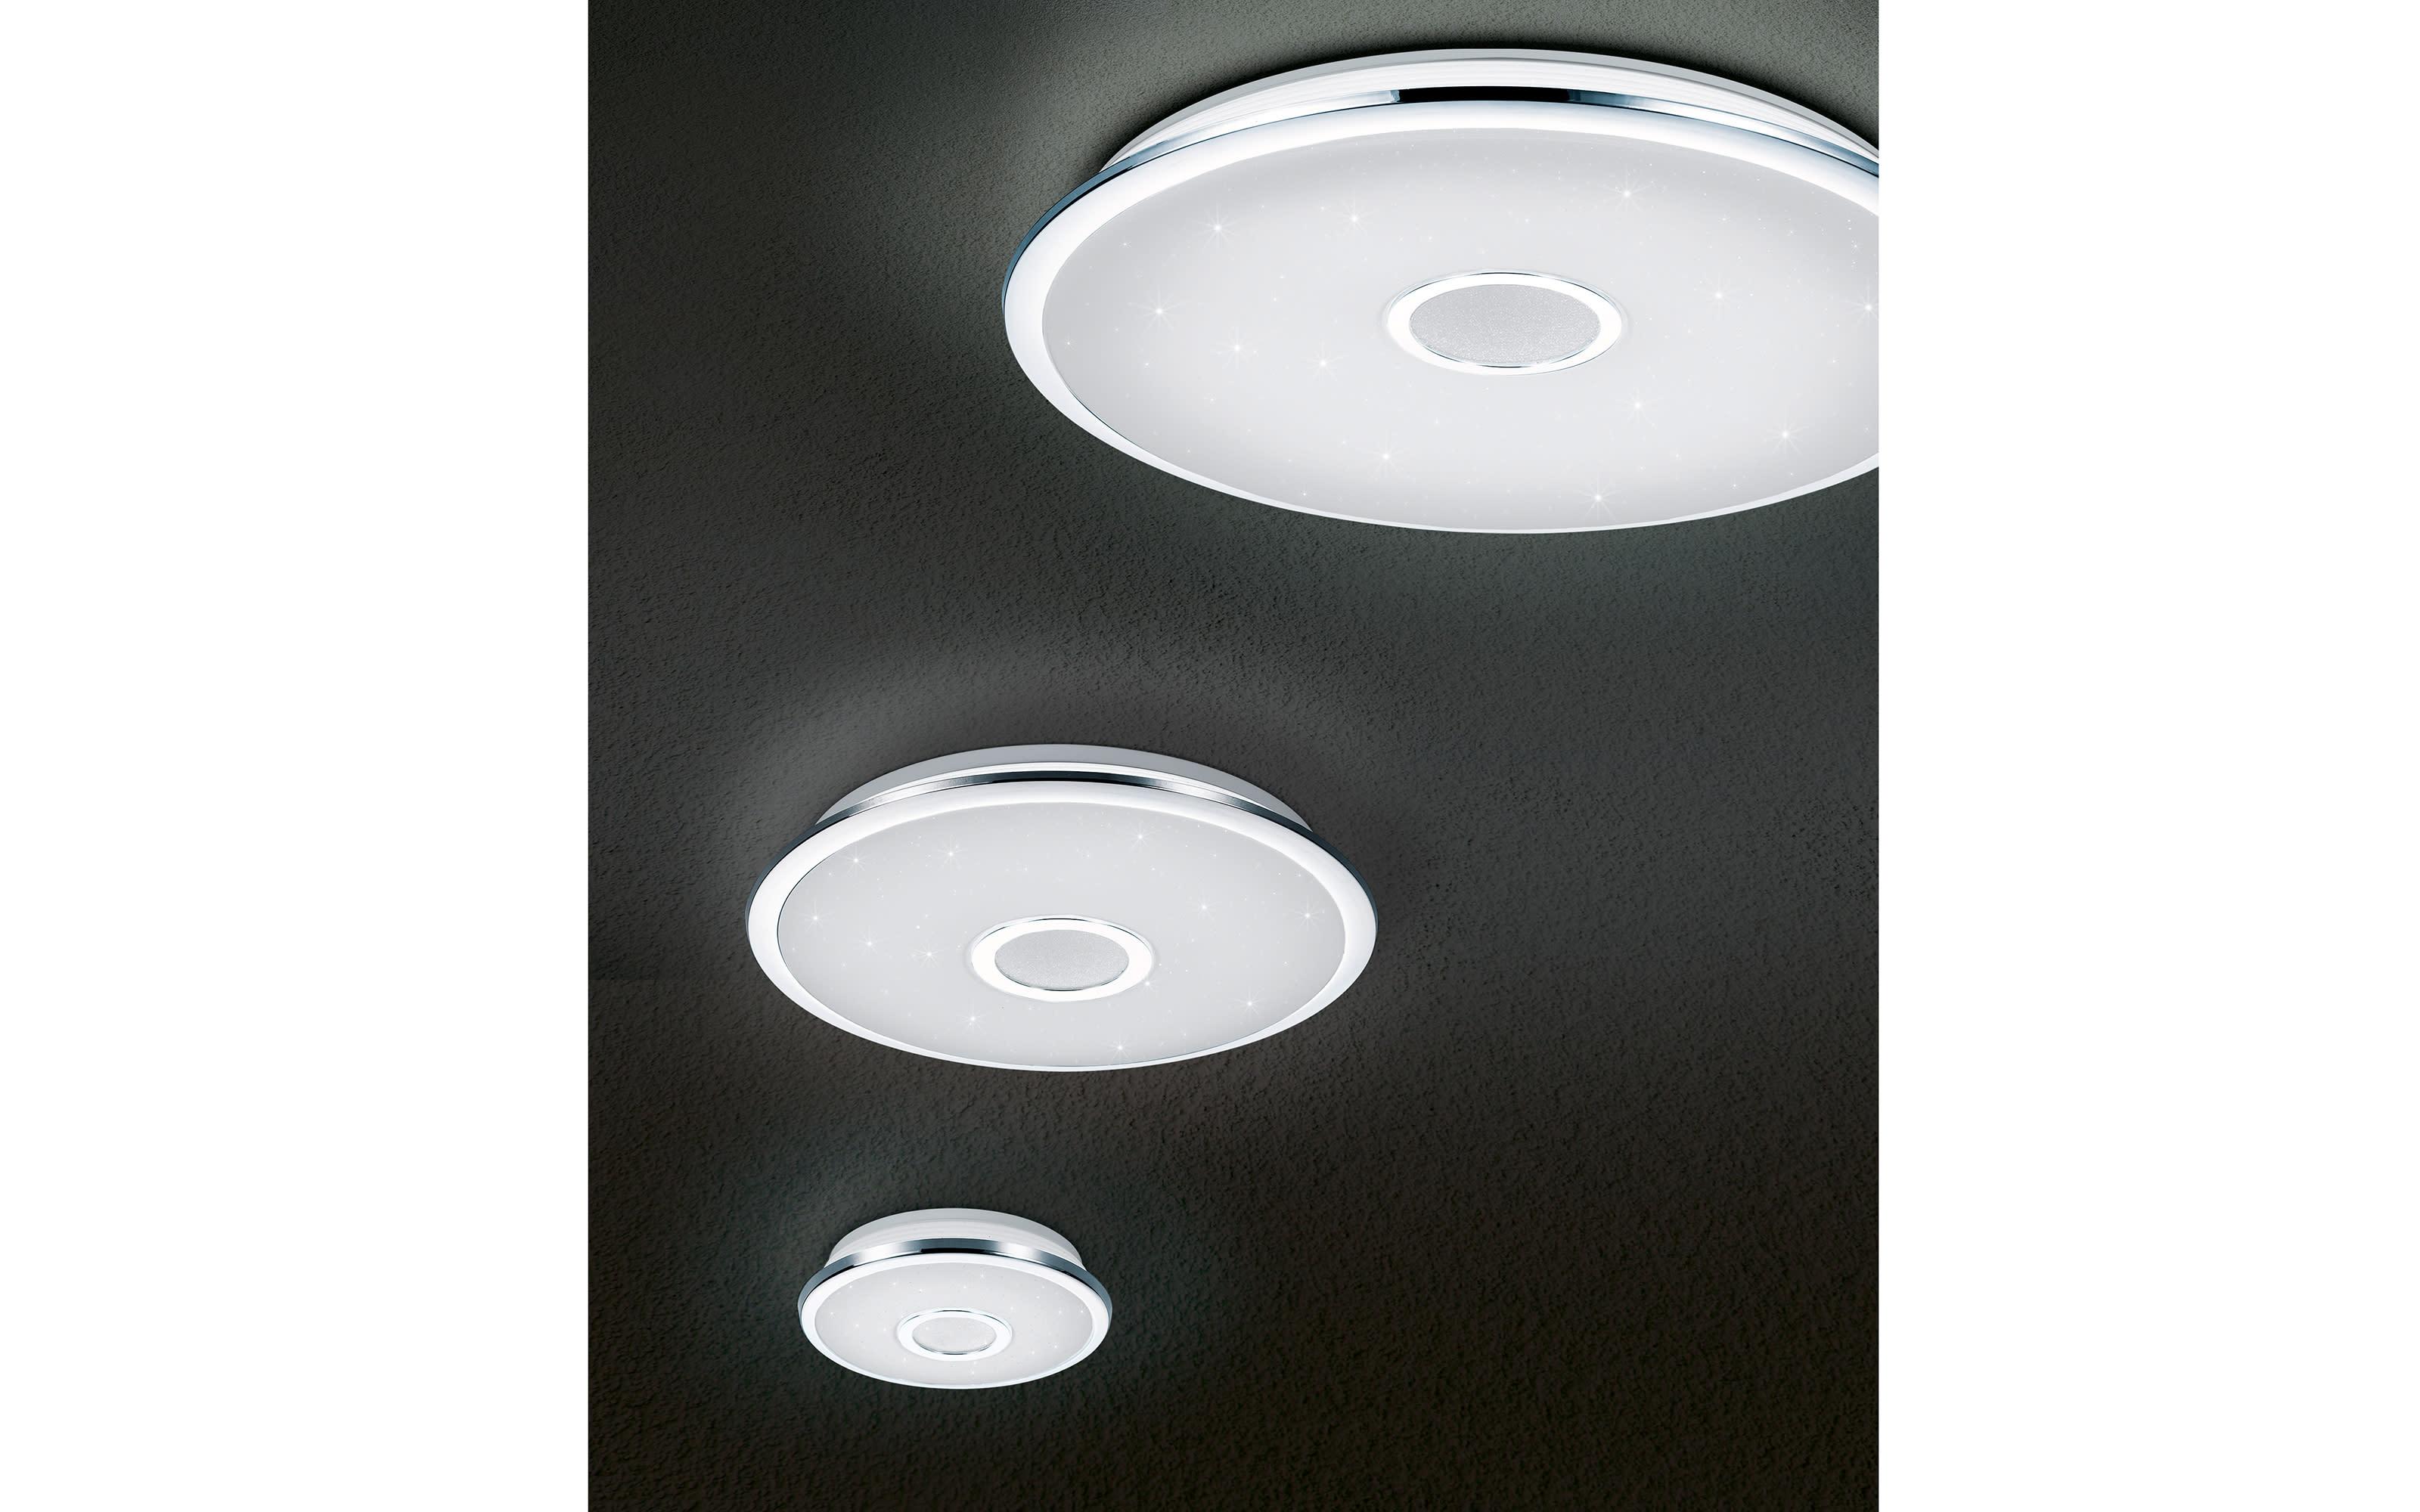 LED-Deckenleuchte Osaka in chromfarbig, 42 cm